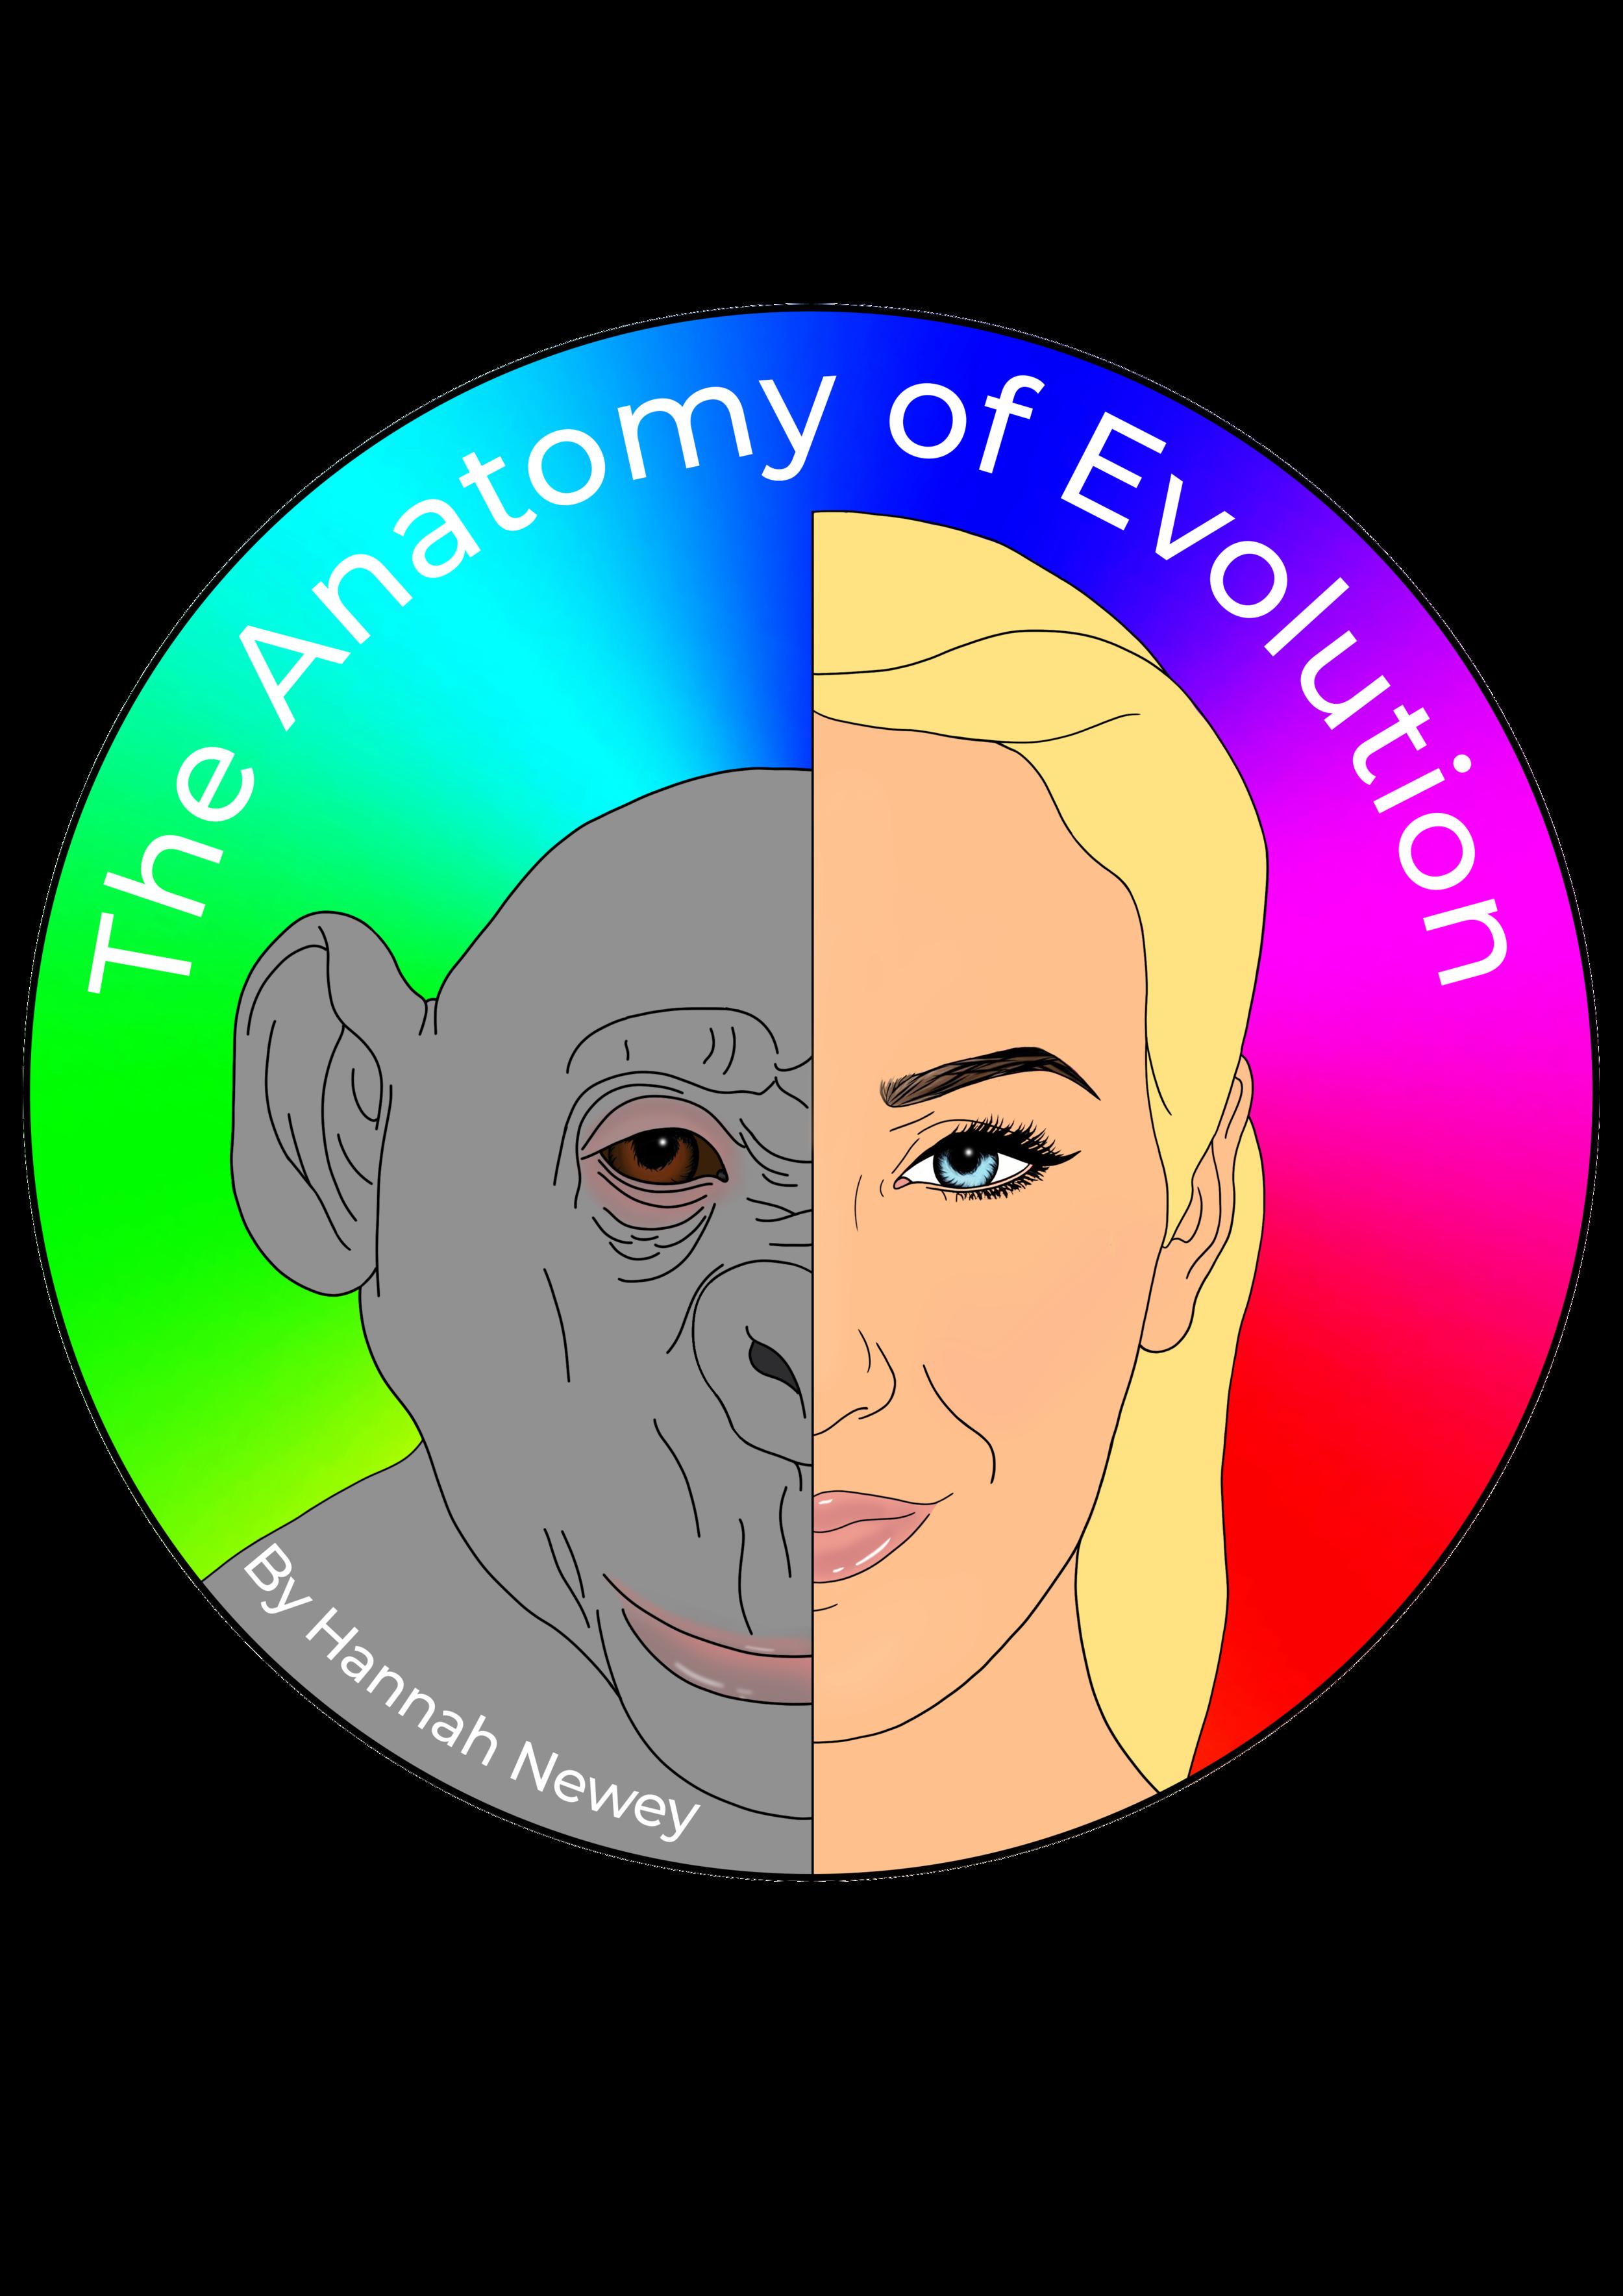 anatomy of evolution logo.png